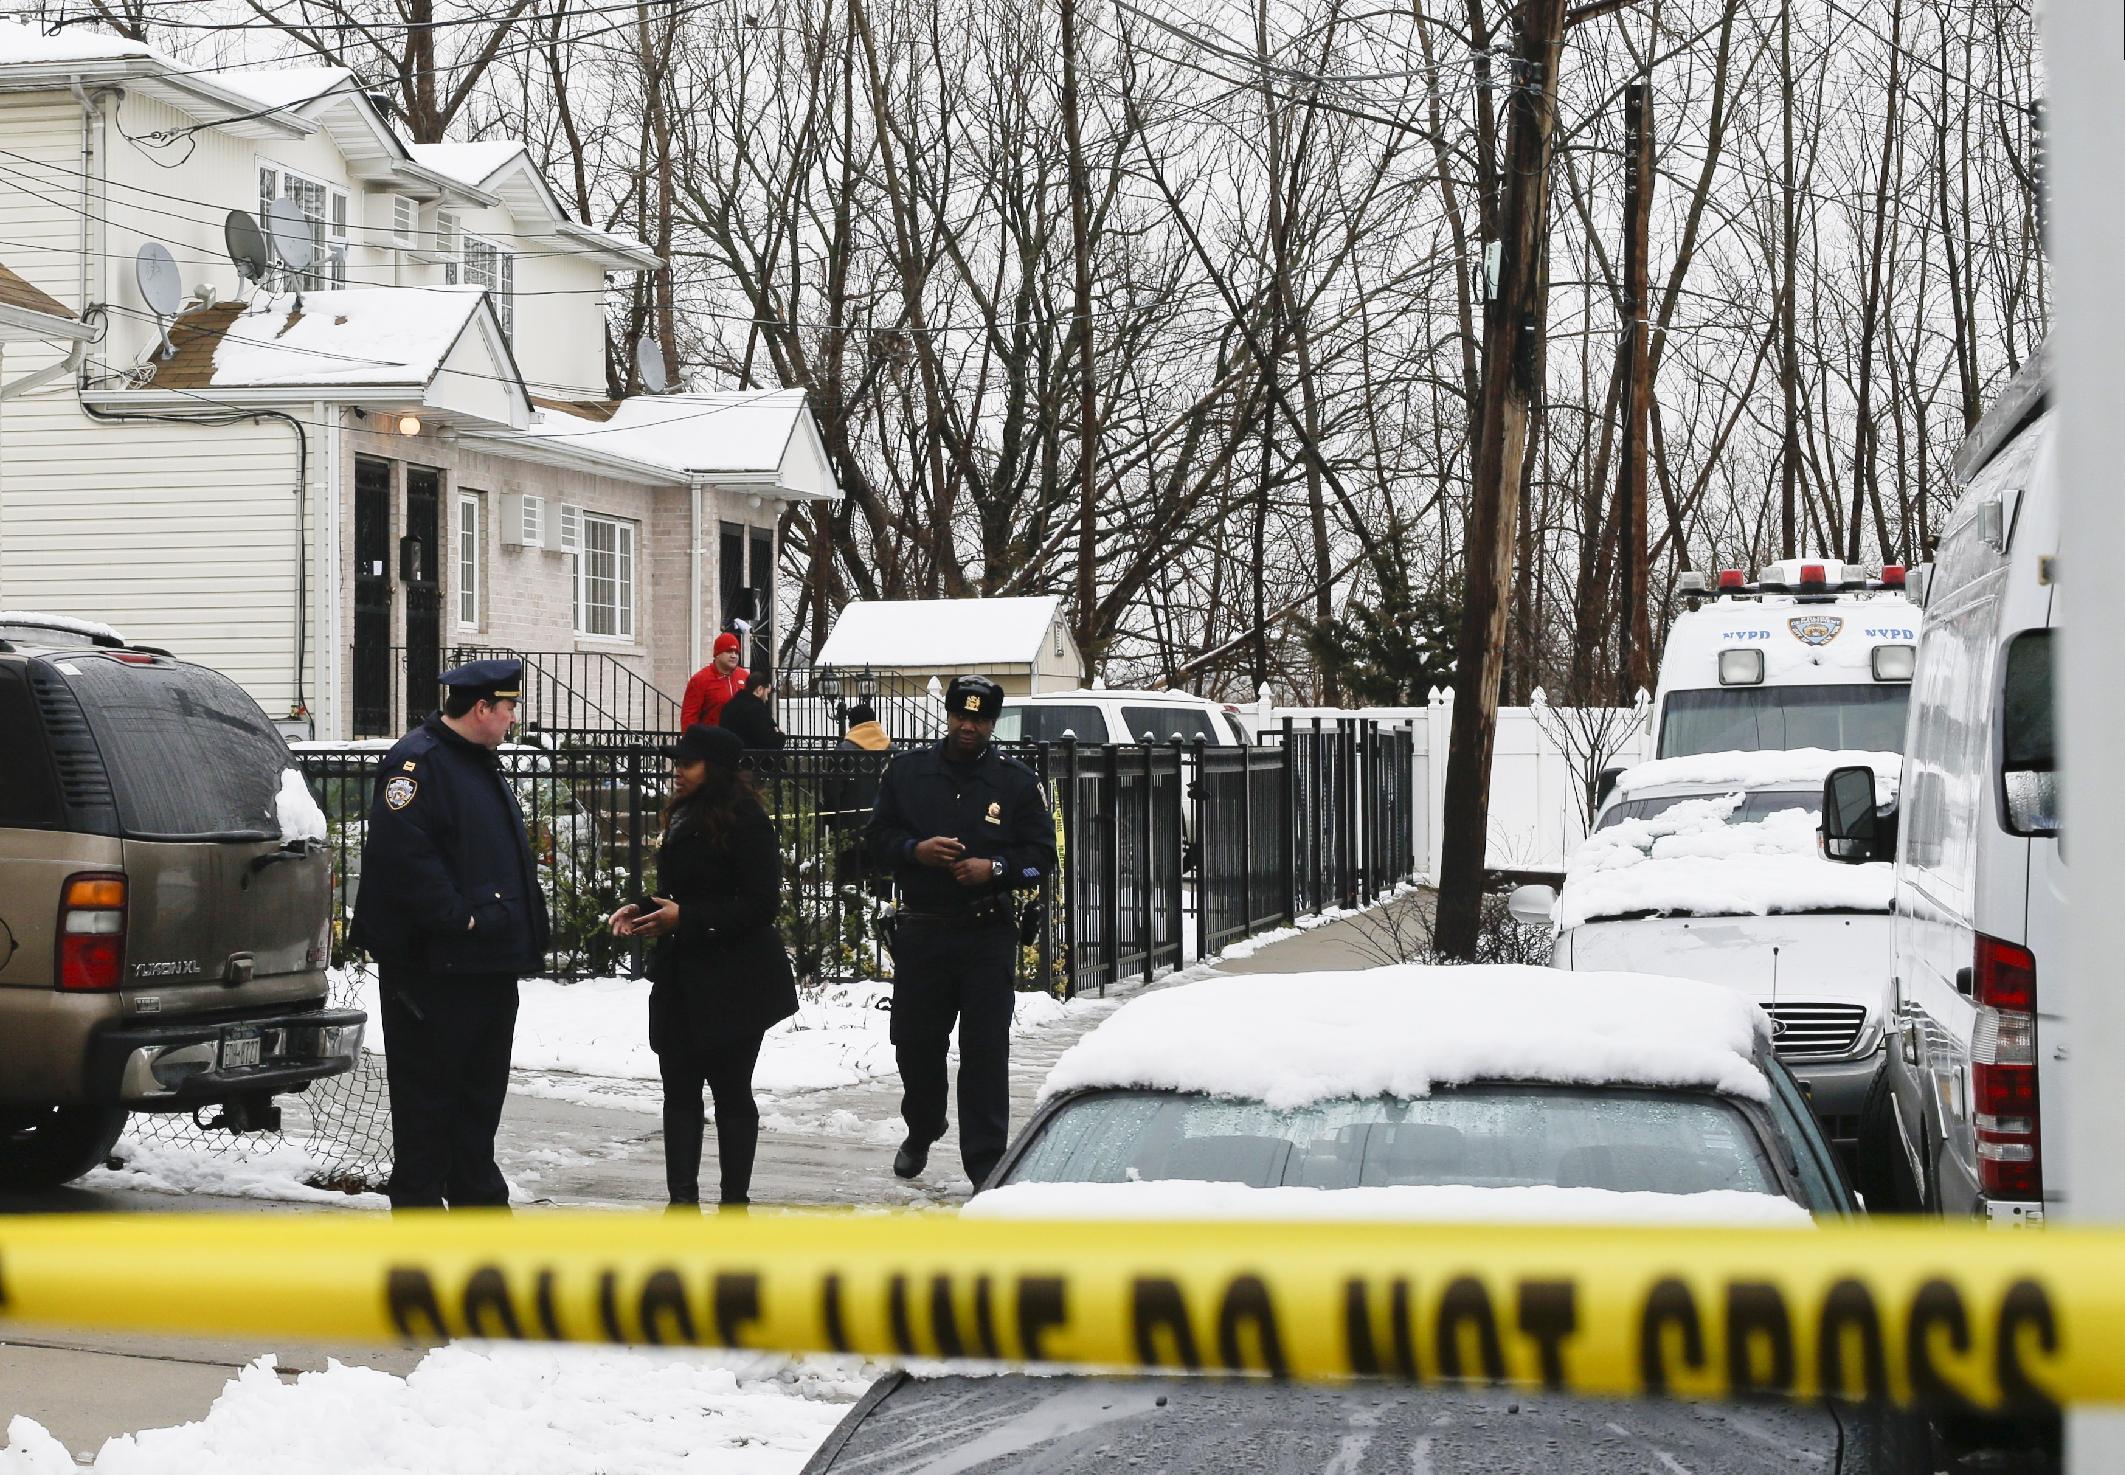 Police: Man shot his family, killing 3, then killed himself